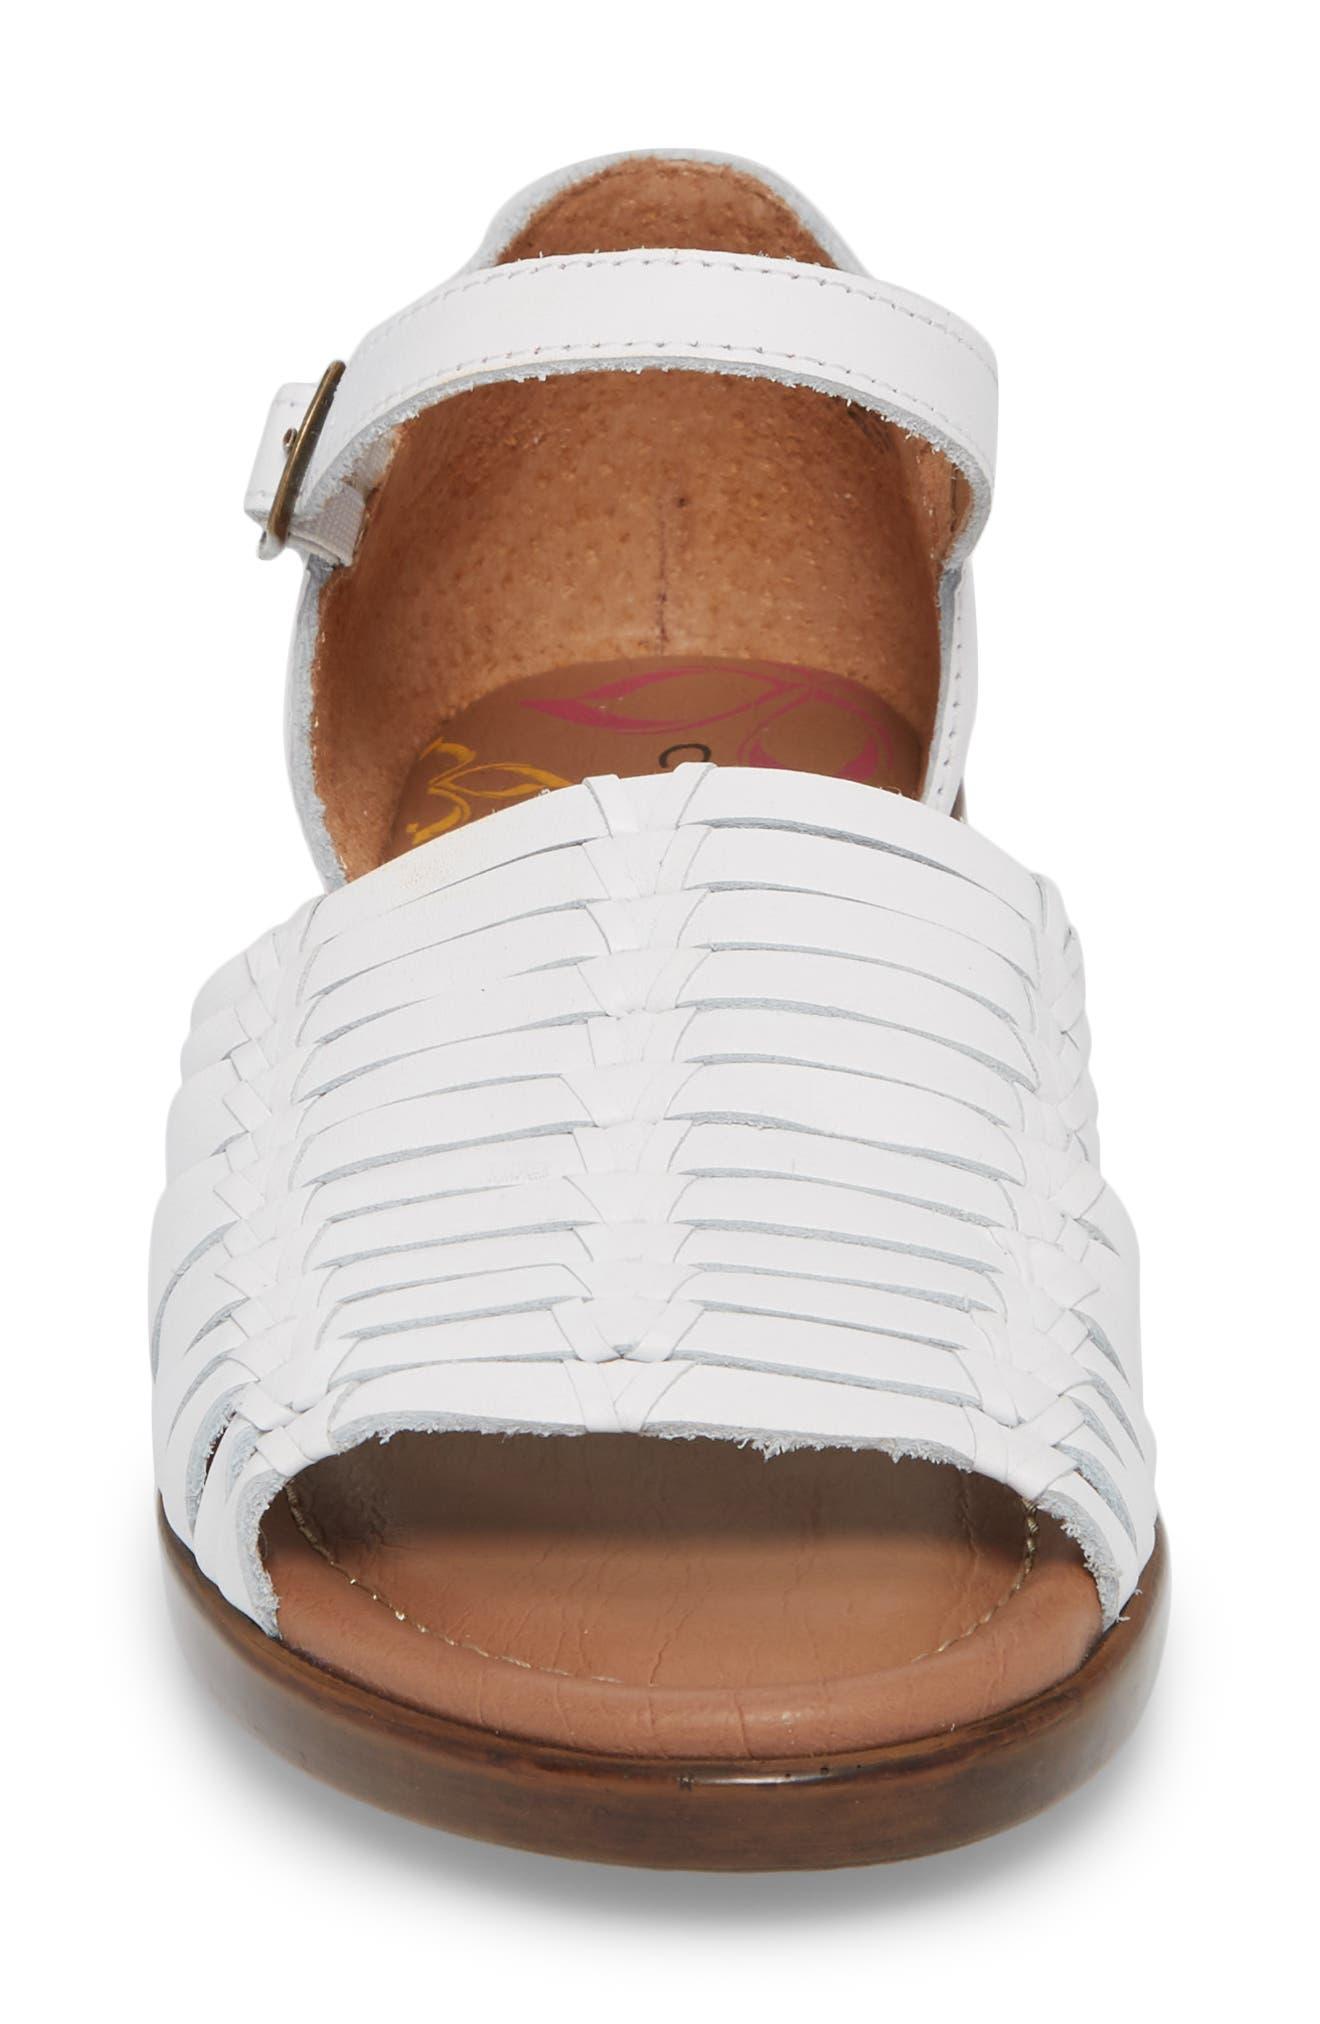 Fayann Sandal,                             Alternate thumbnail 4, color,                             White Leather